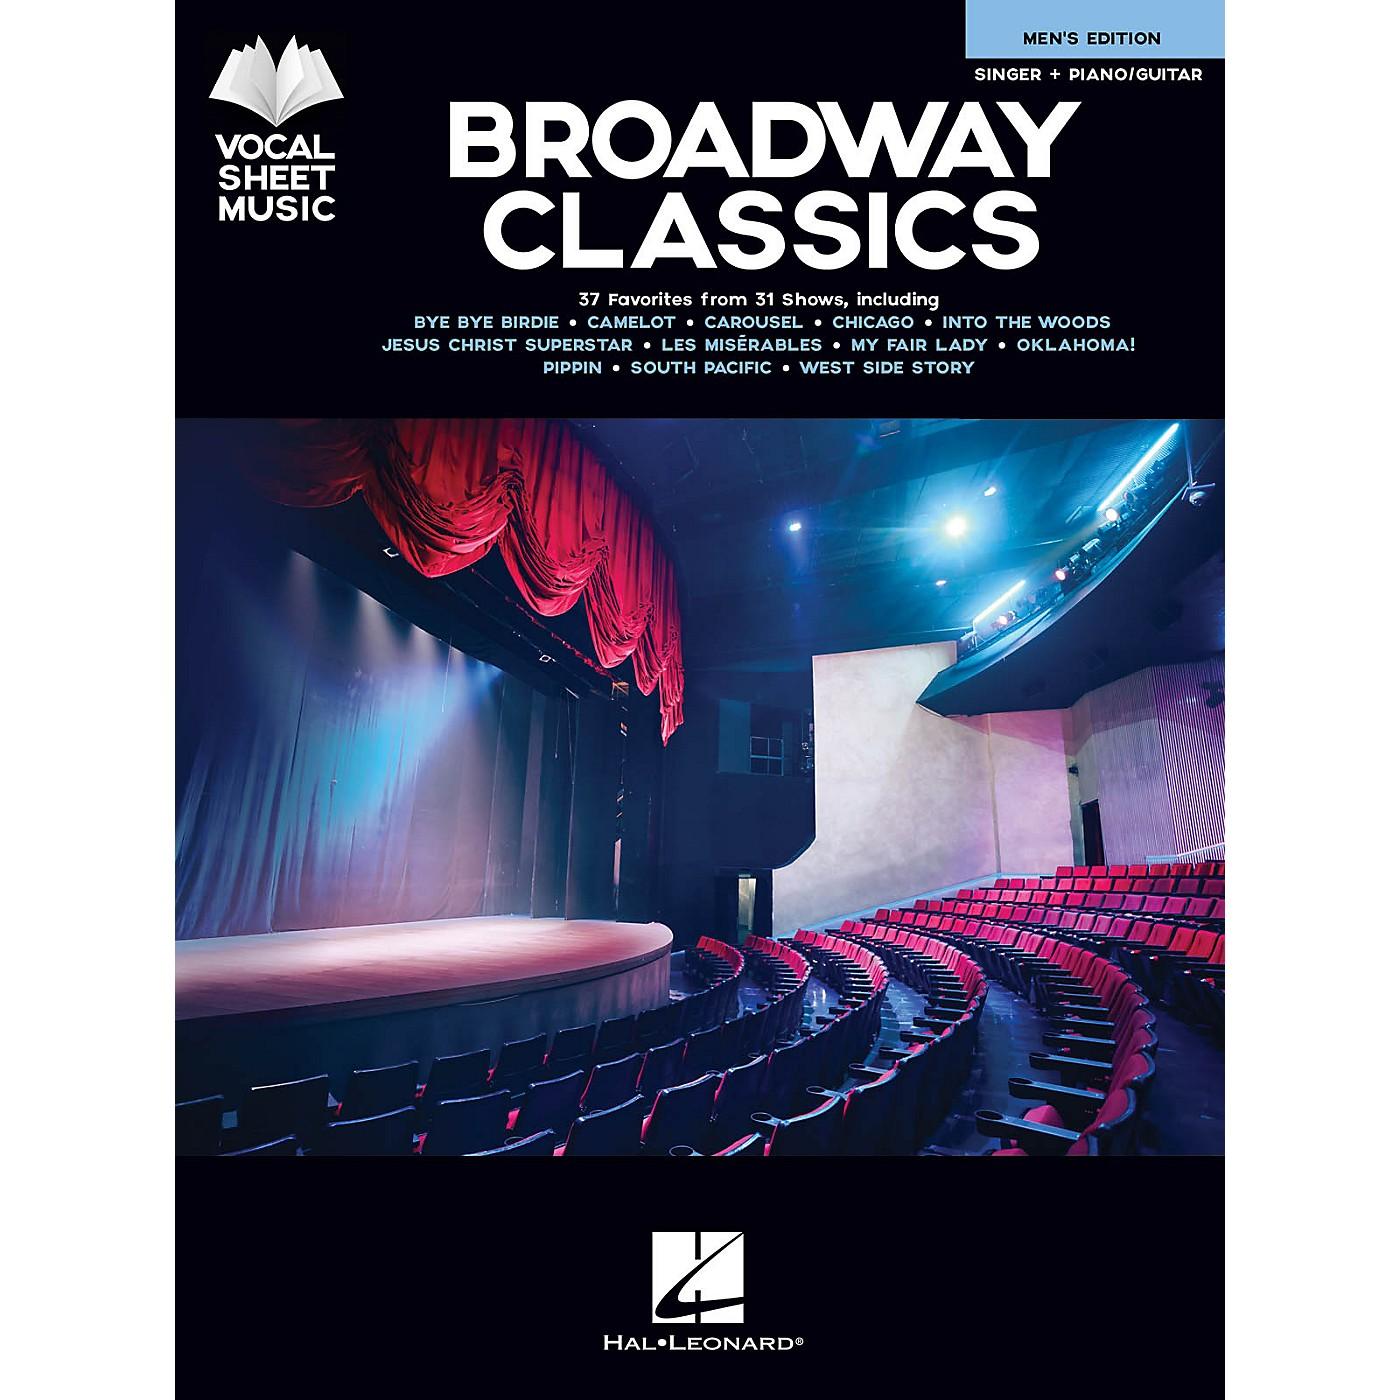 Hal Leonard Broadway Classics - Men's Edition (Singer + Piano/Guitar) Vocal Sheet Series Songbook thumbnail